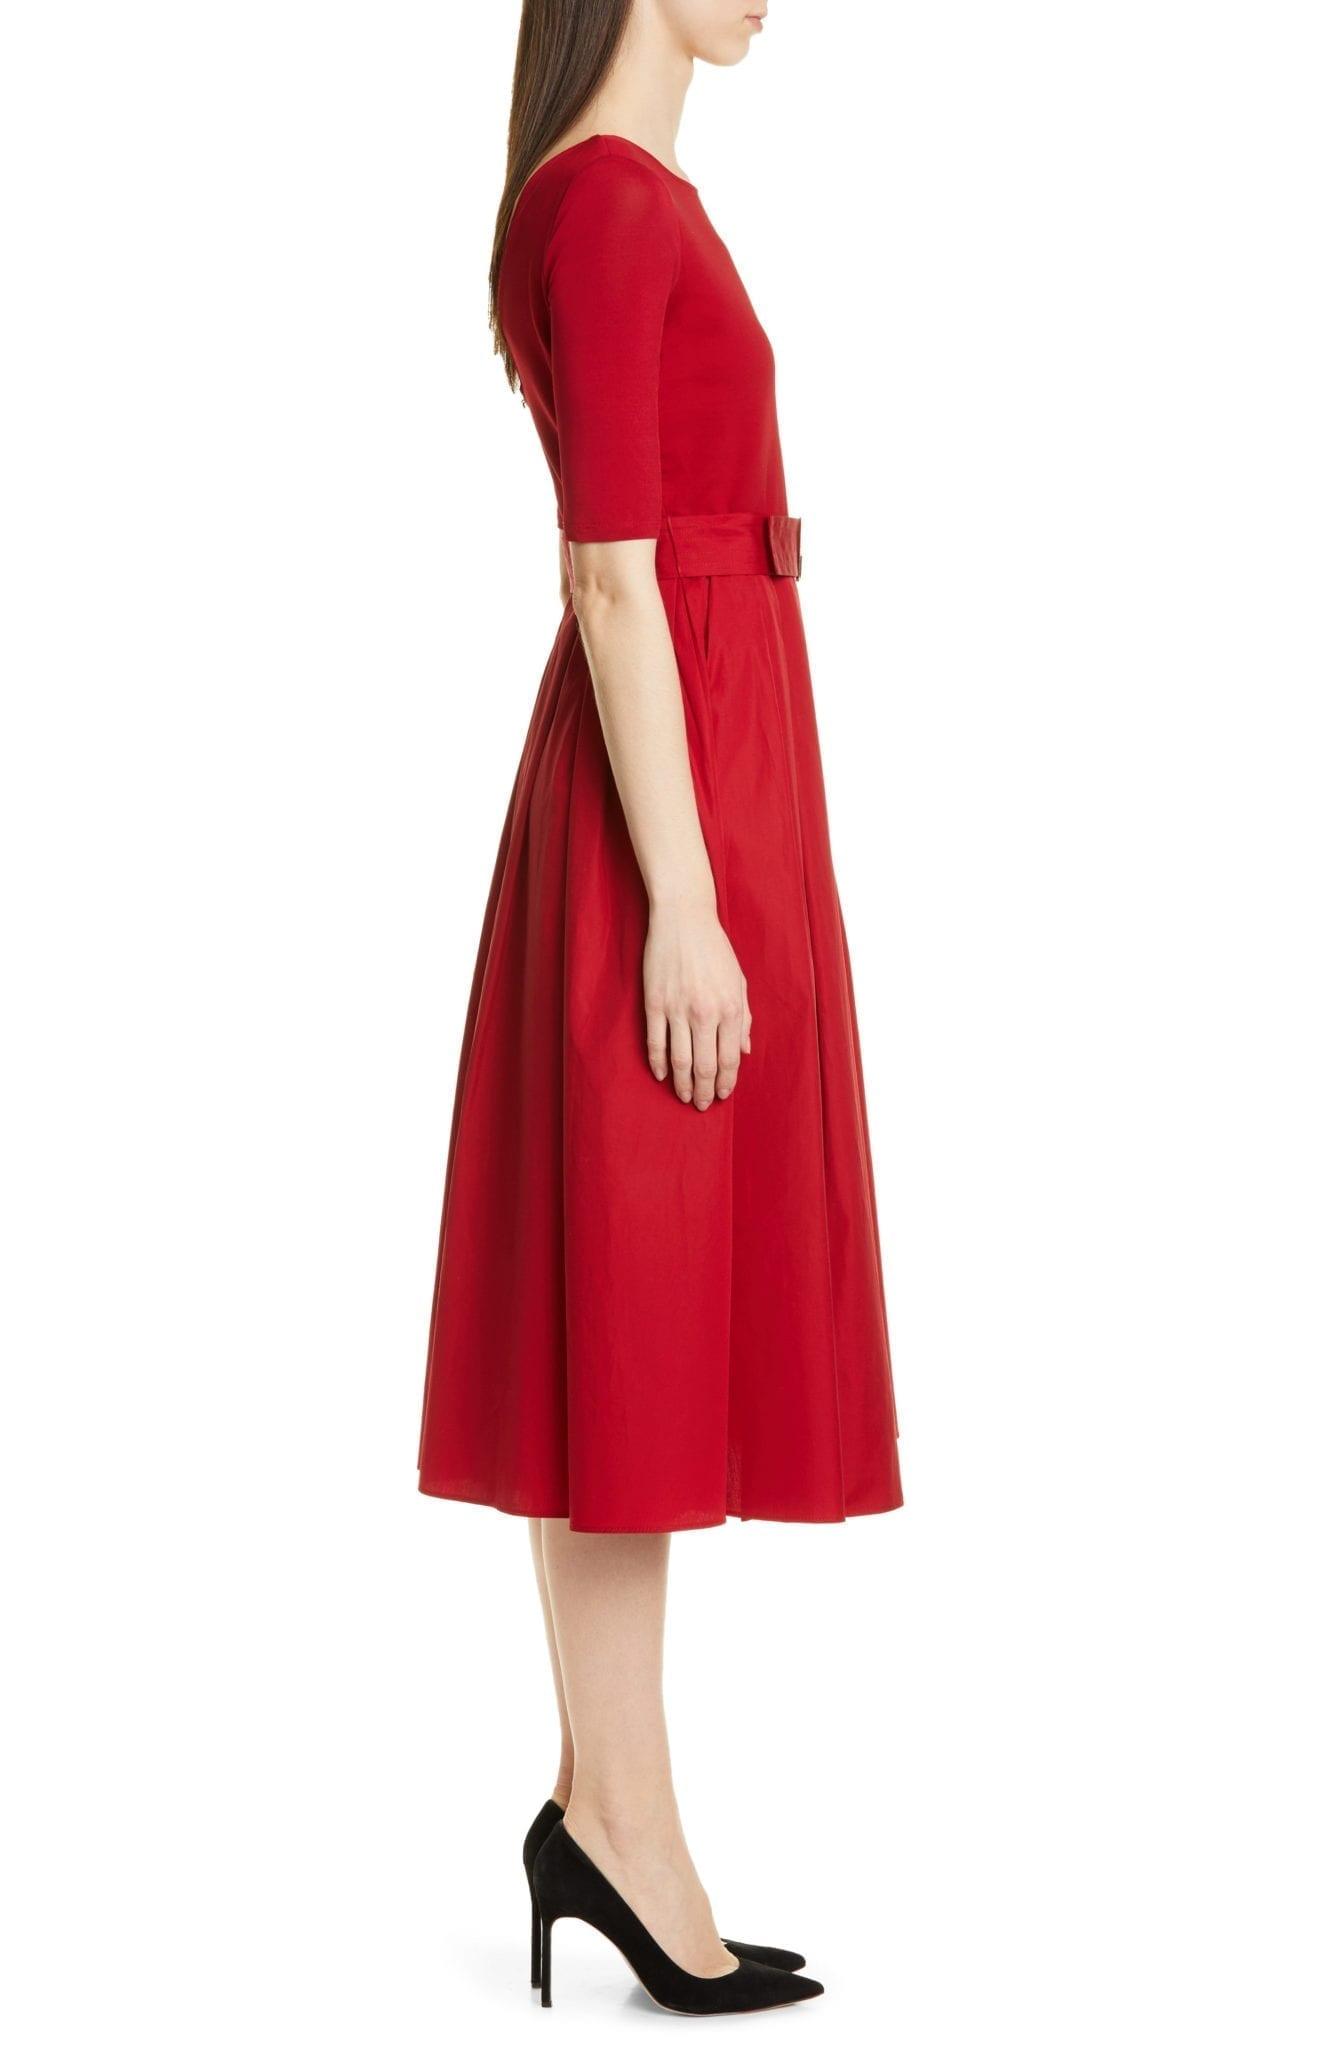 MAX MARA Affine Belted Midi Red Dress